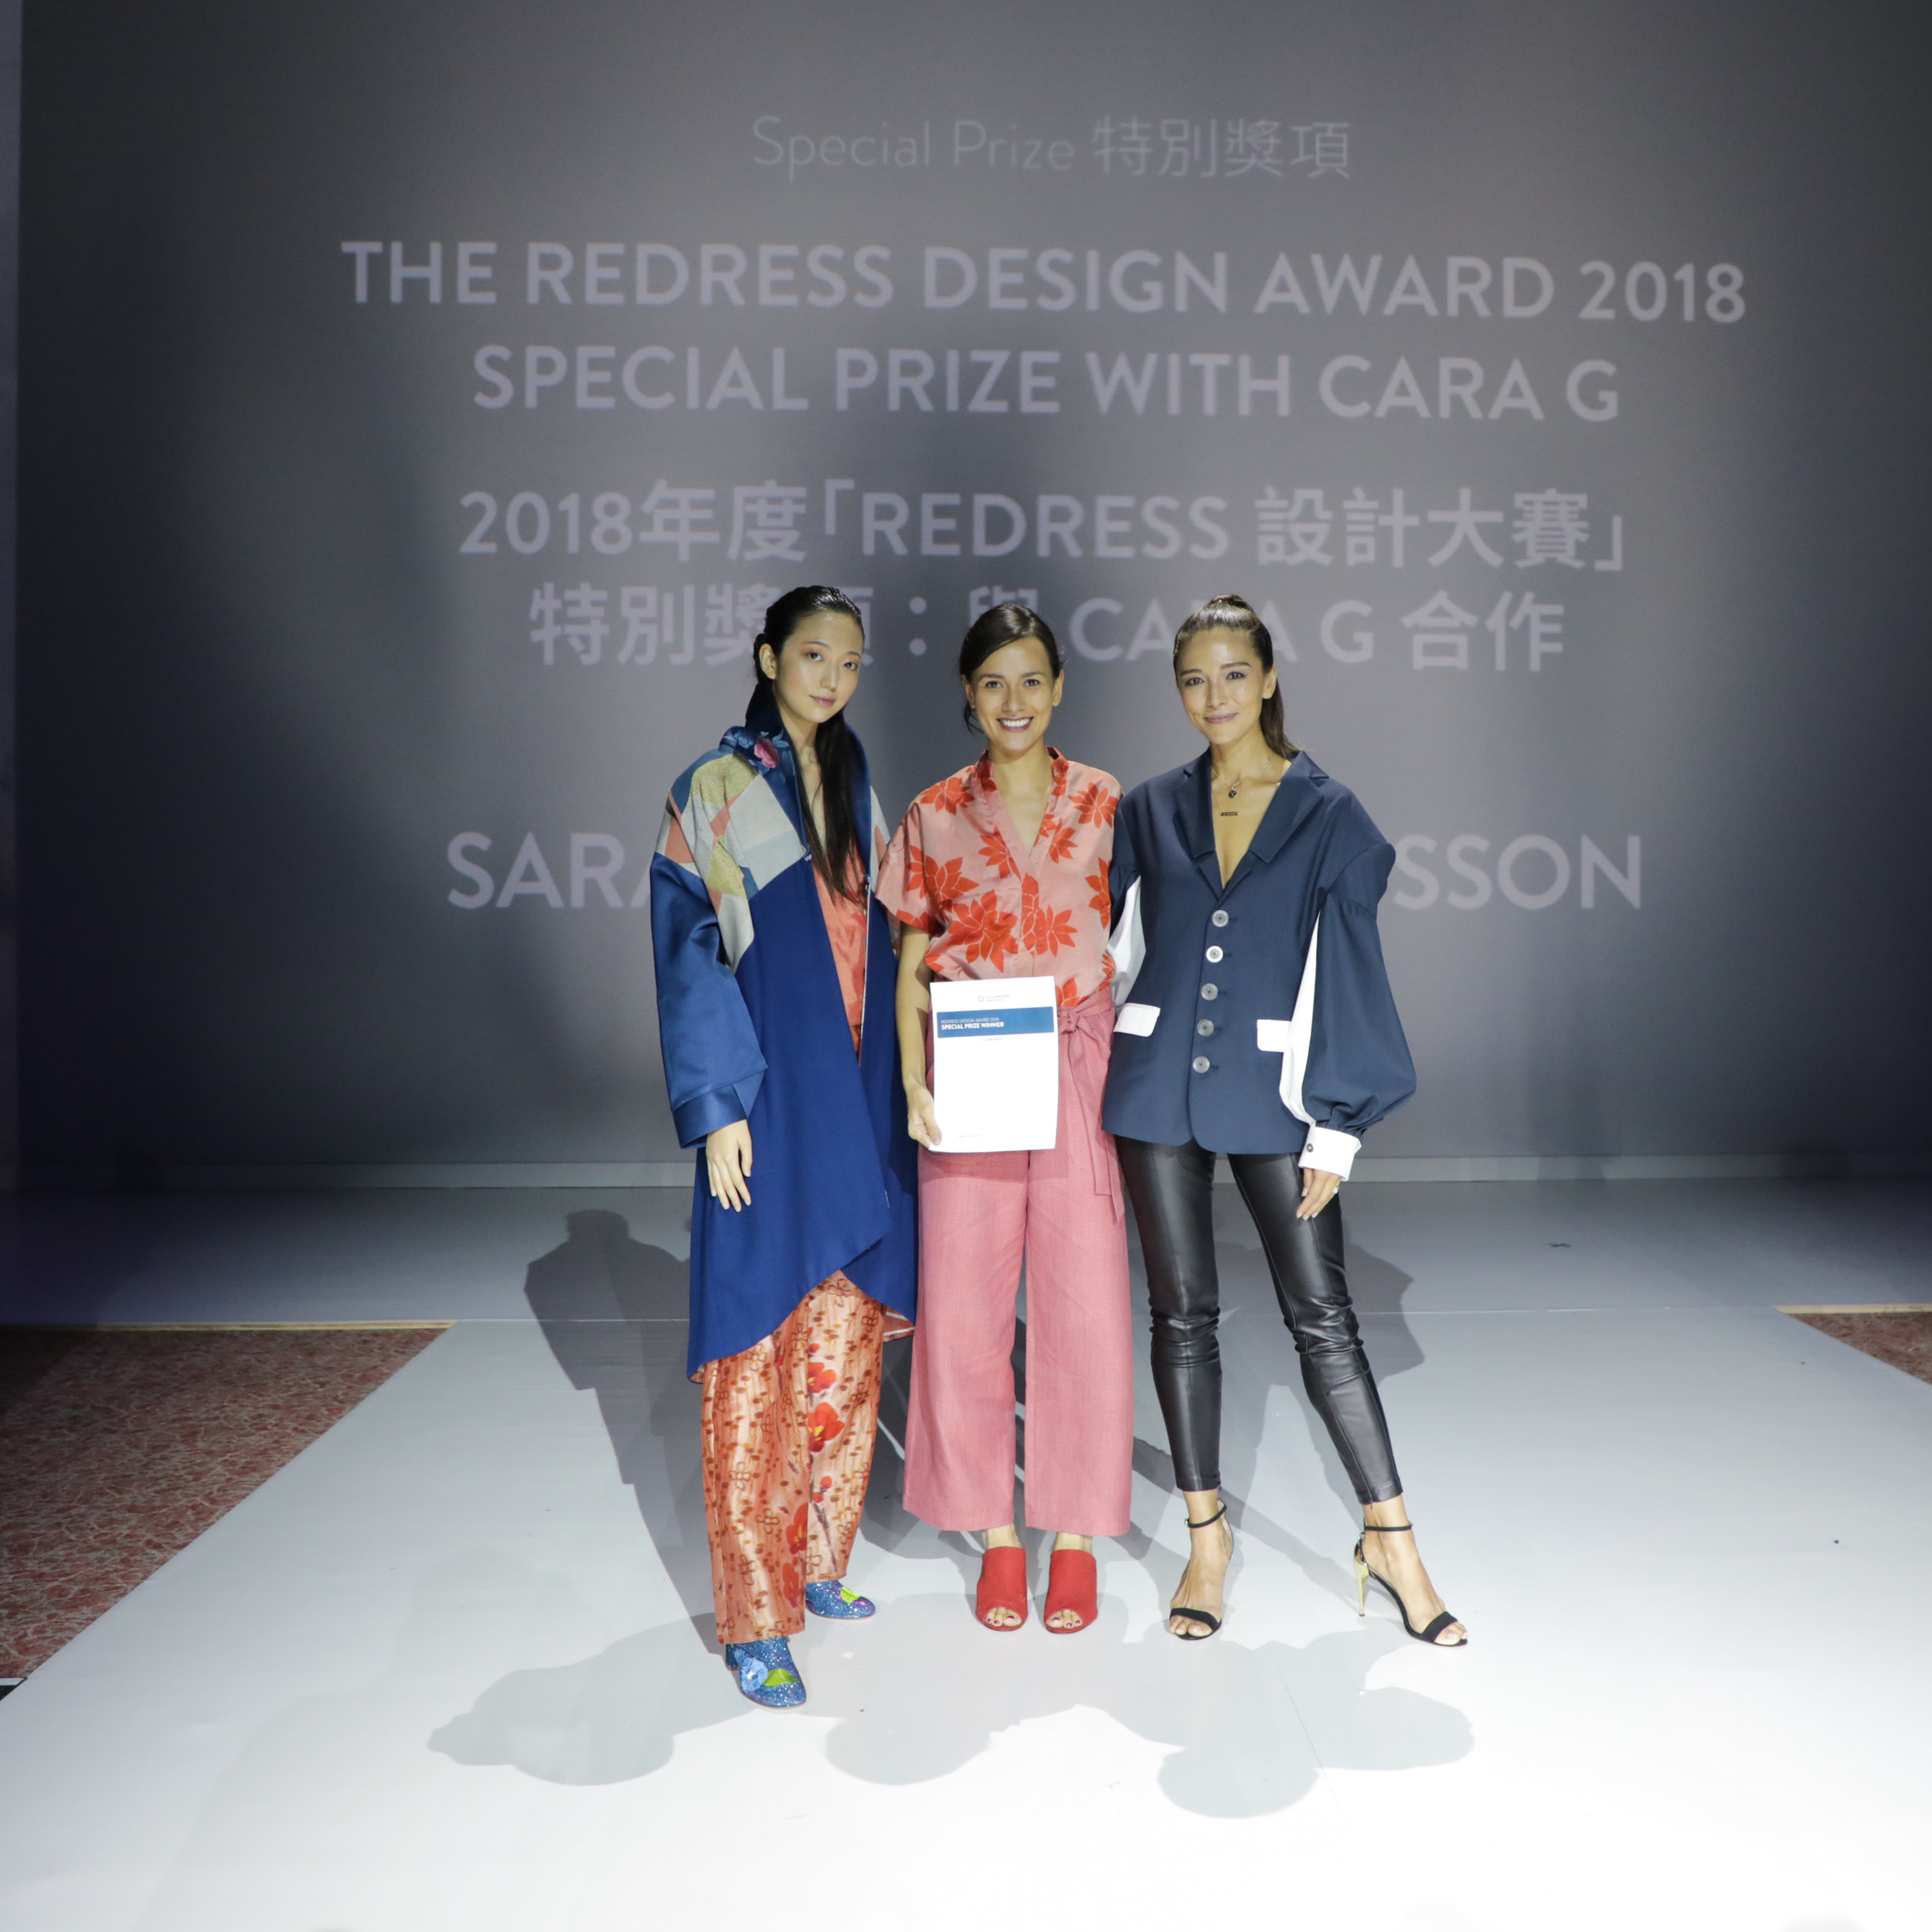 Special Prize: The Redress Design Award 2018 Special Prize with Cara G   Sarah Jane Fergusson, Japan